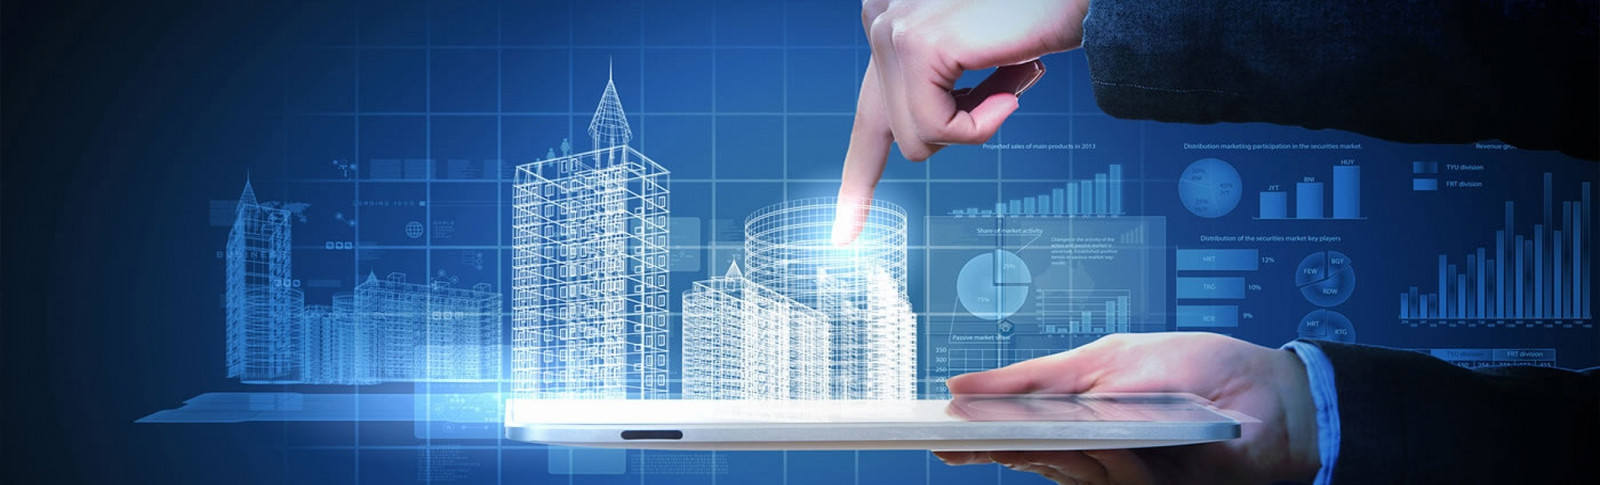 Facility Management and Application Of New Technologies (Tesis Yönetimi ve Yeni Teknoloji Uygulamaları)